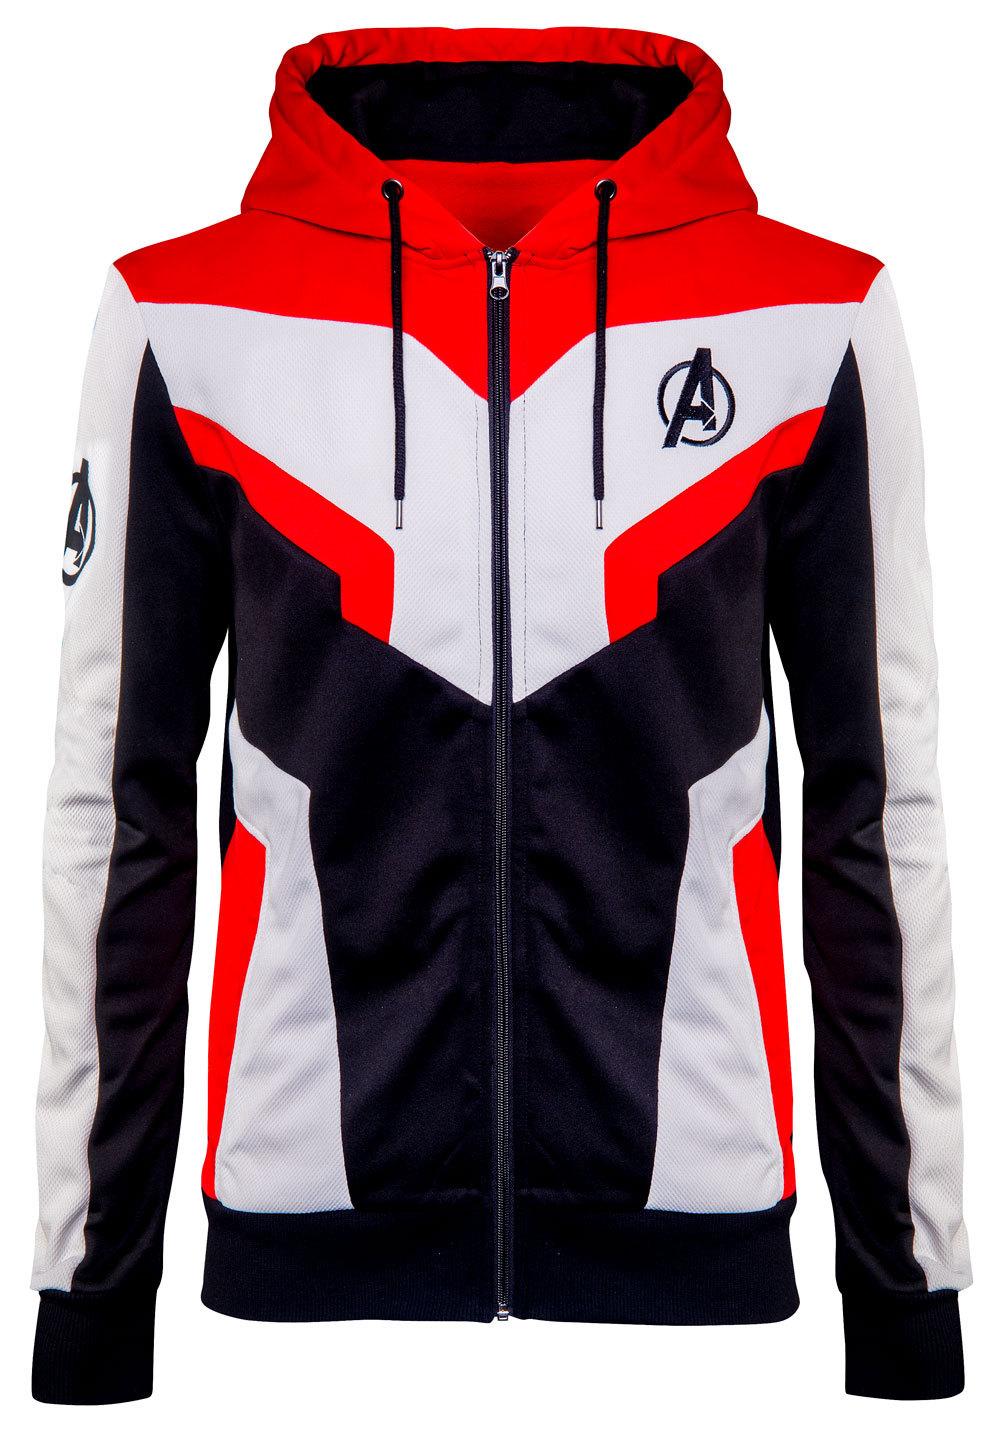 Mens avengers endgame quantum hoodie jacket